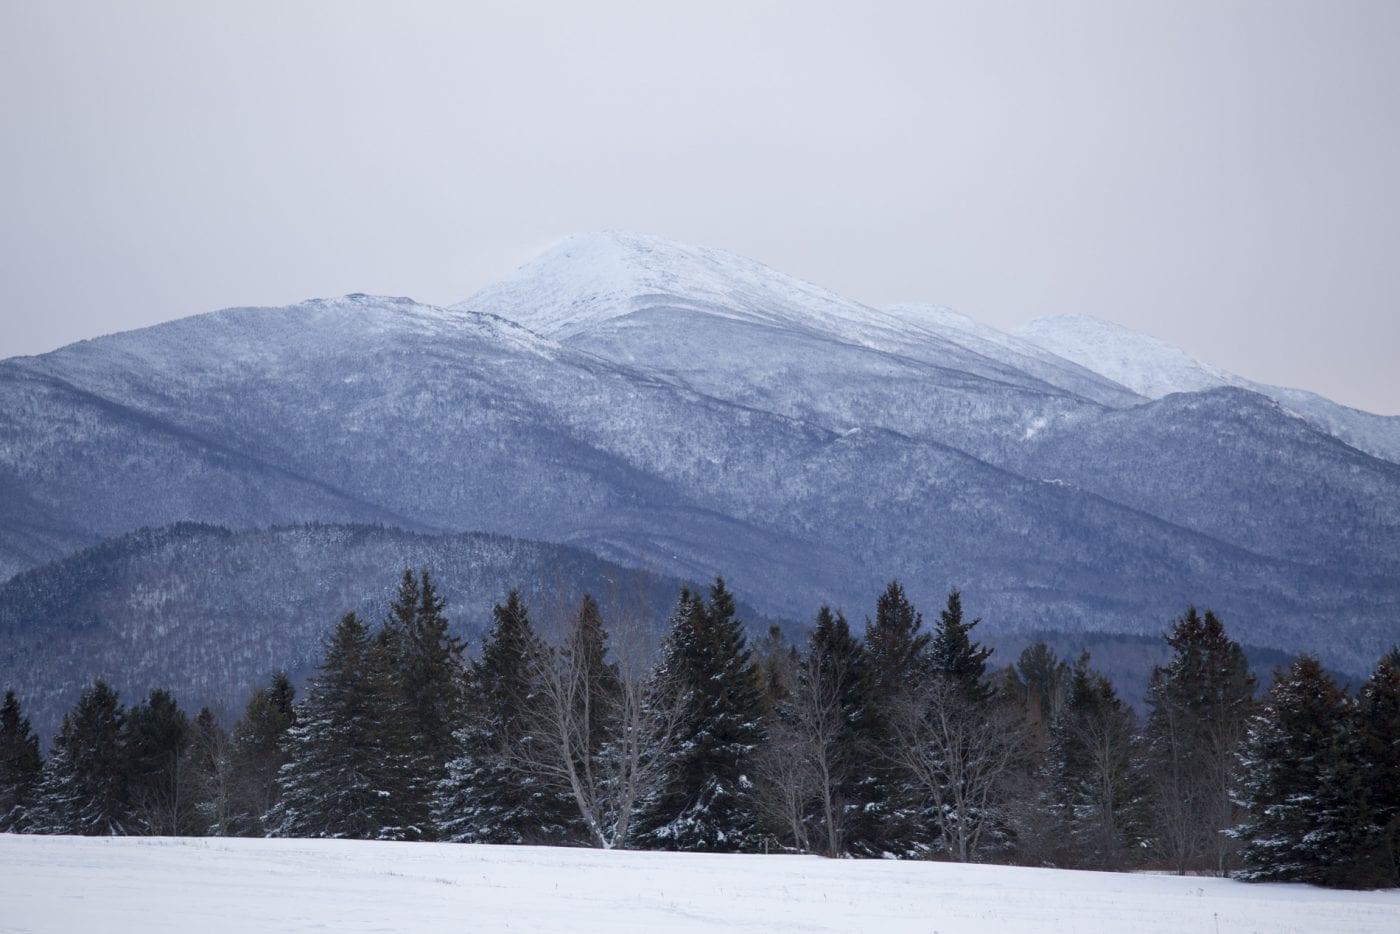 Snowy-Peaks-Adirondacks-Mike-Lynch-11